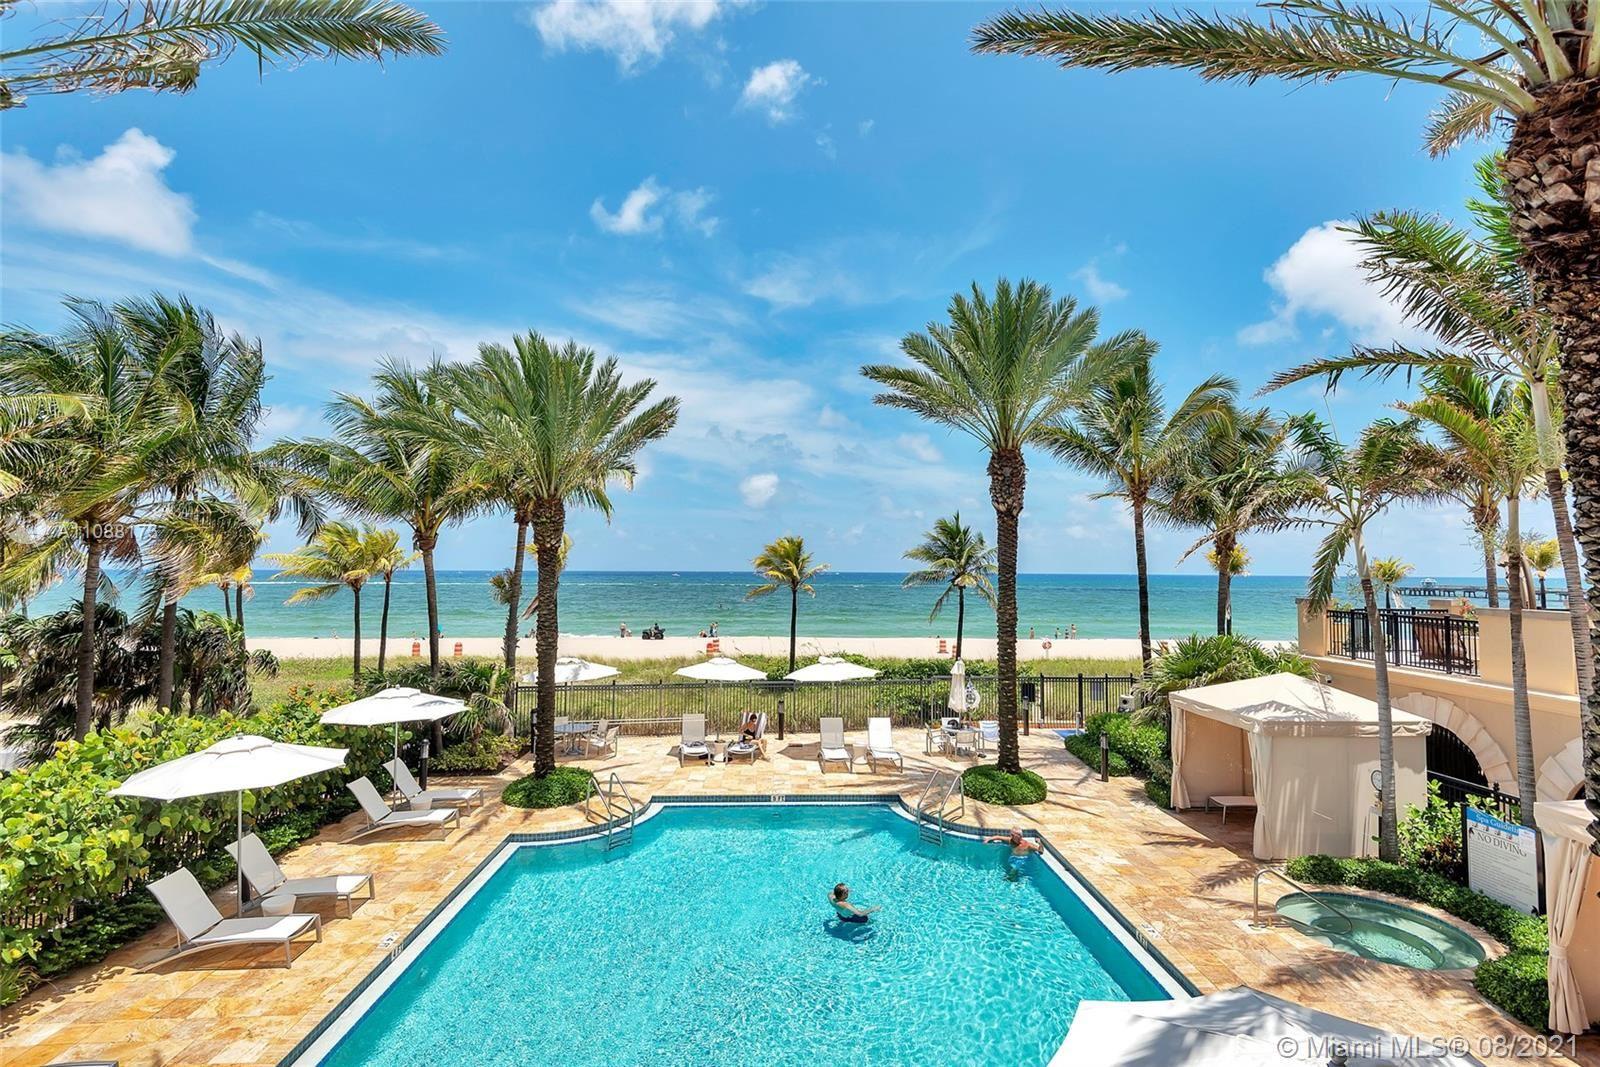 Photo of 4511 El Mar Dr #PH 401, Lauderdale By The Sea, FL 33308 (MLS # A11088173)